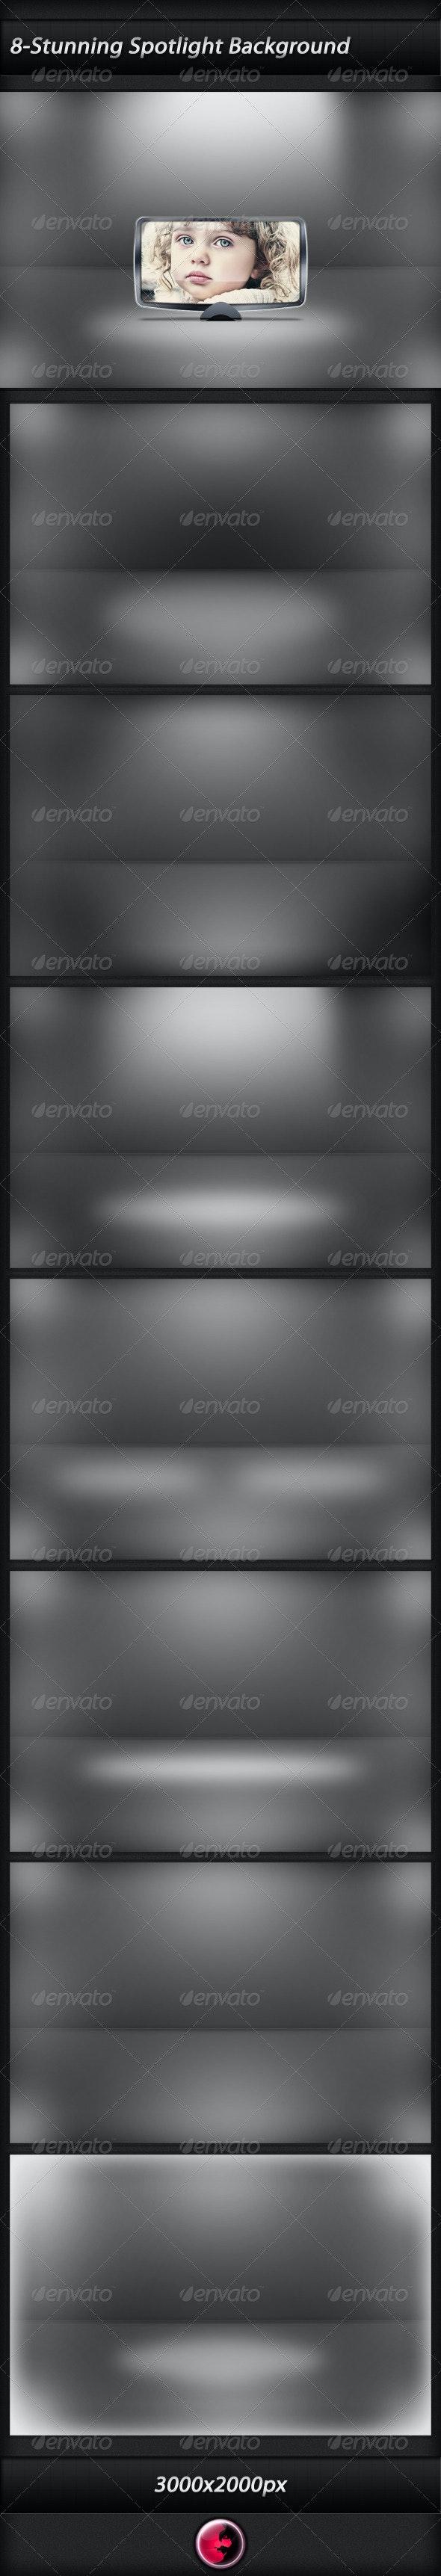 Eligant Floor Spotlight Background - 3D Backgrounds